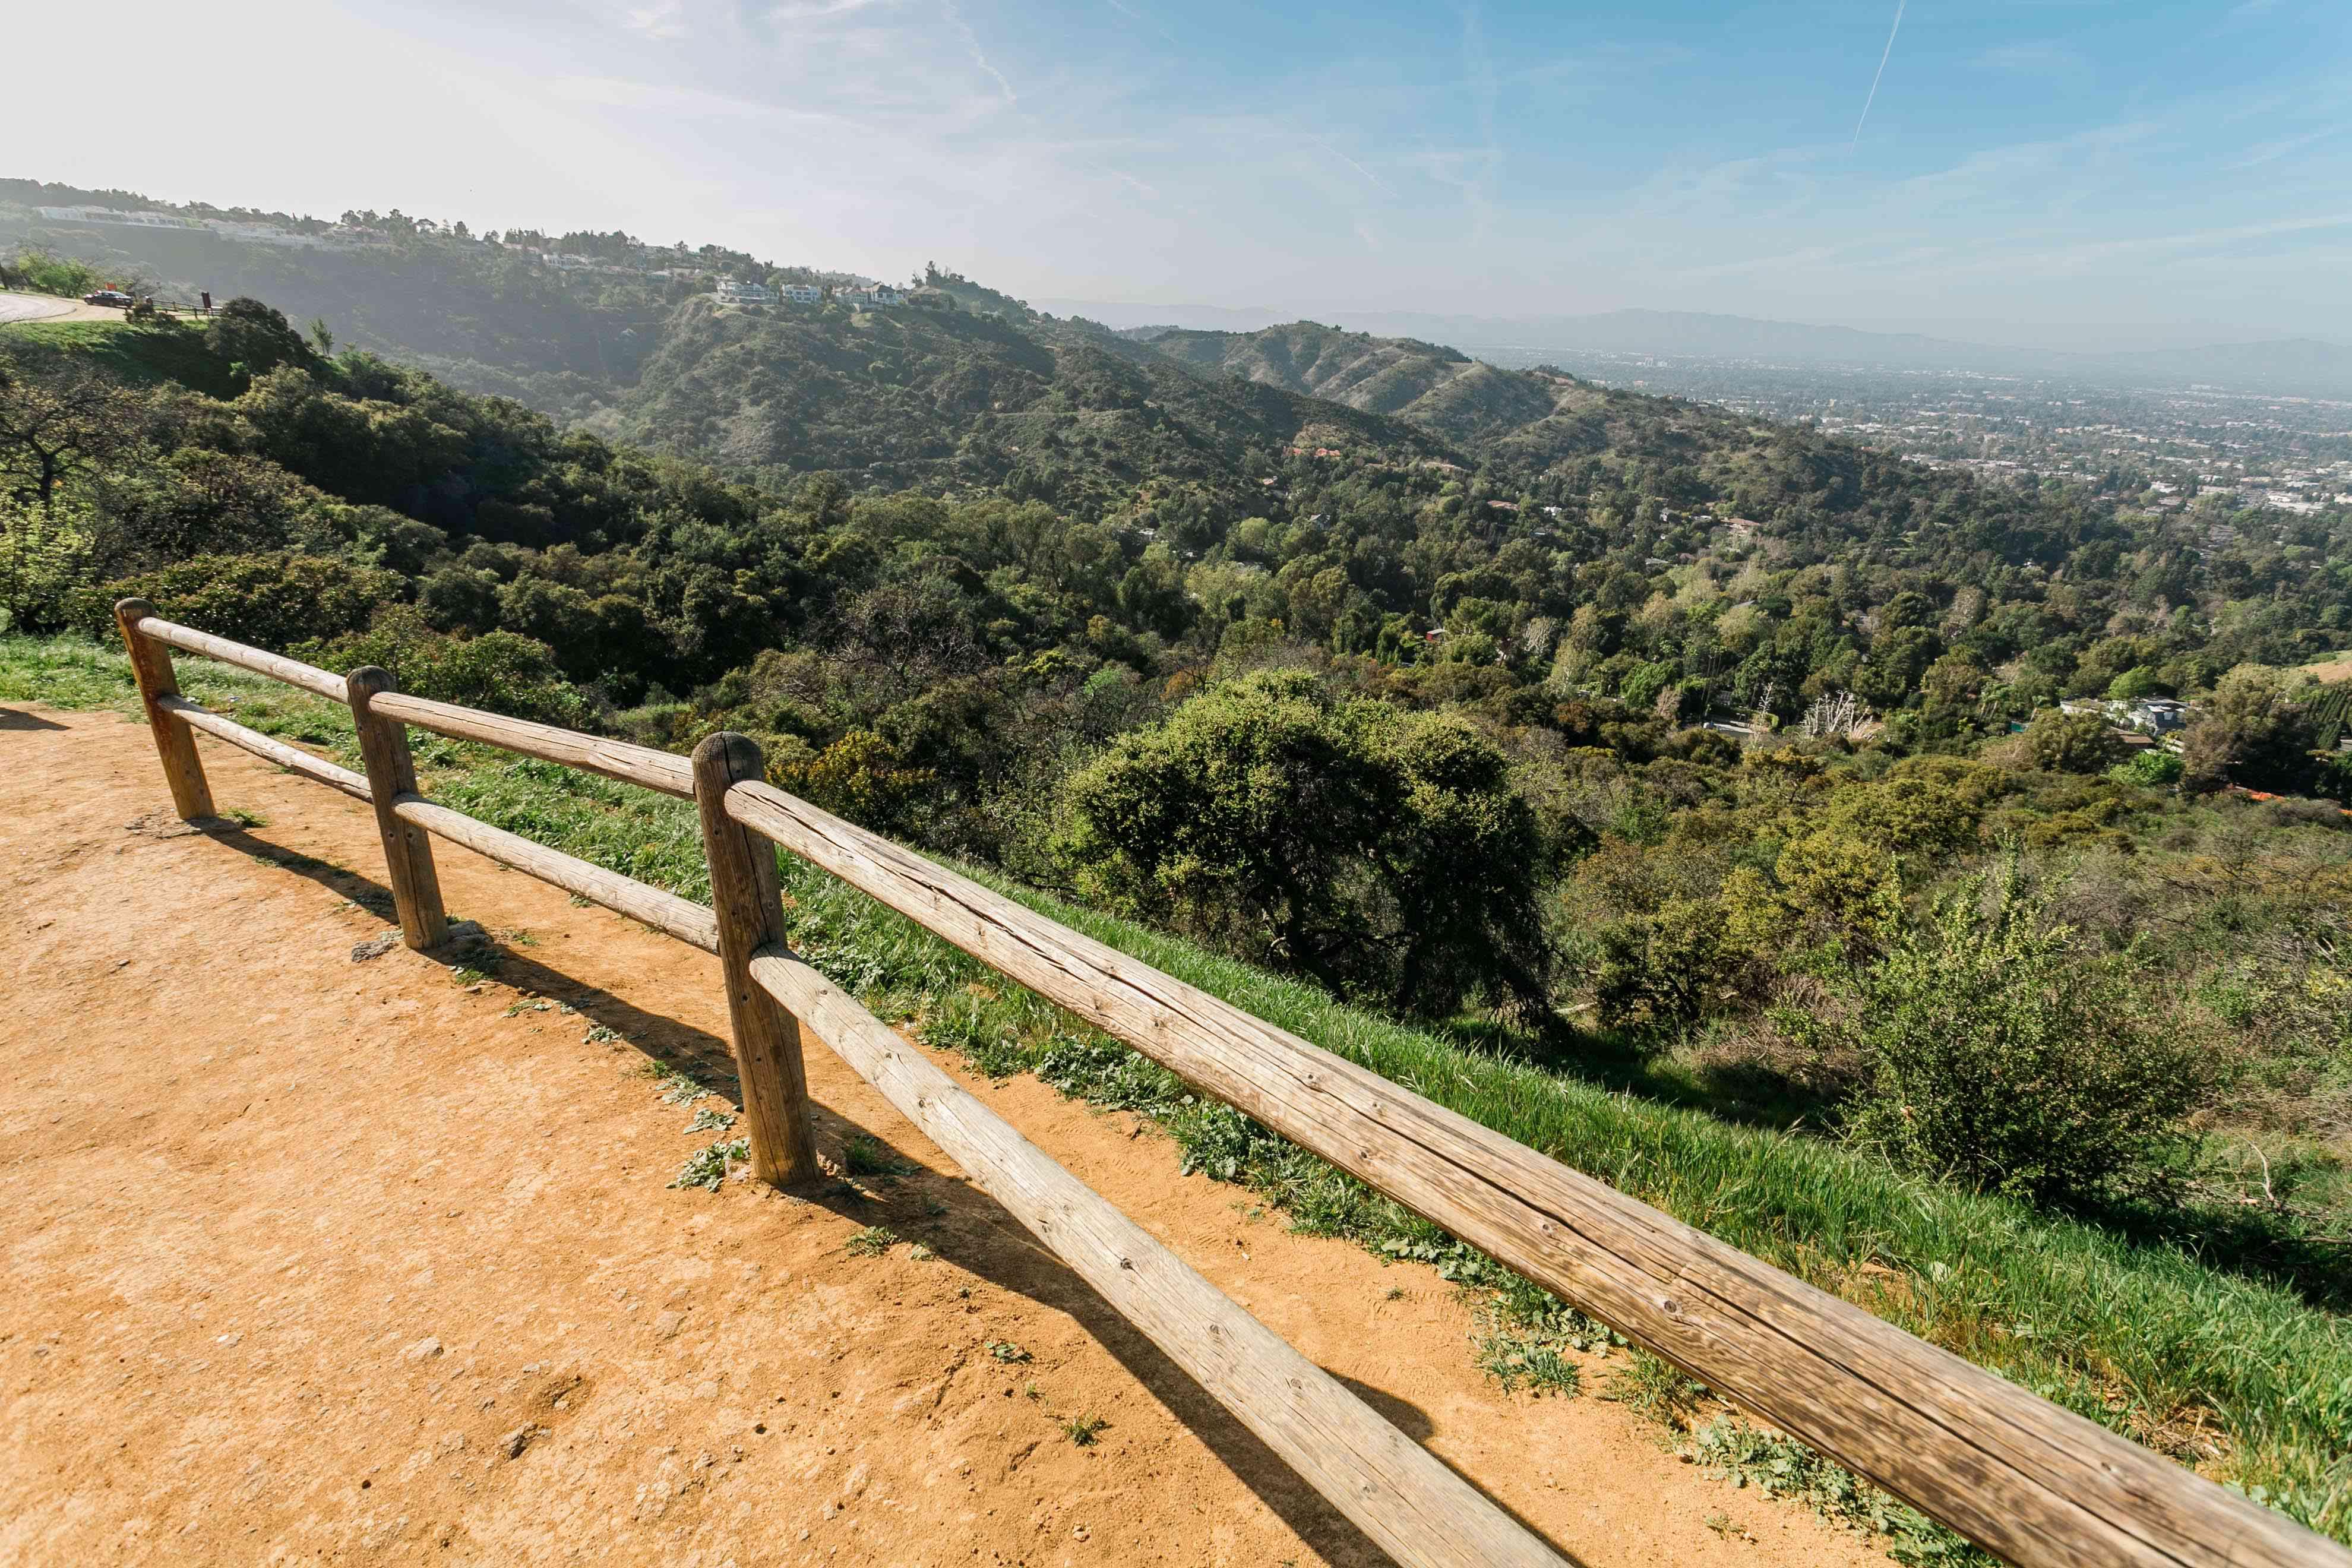 Mulholland Drive Overlook in LA